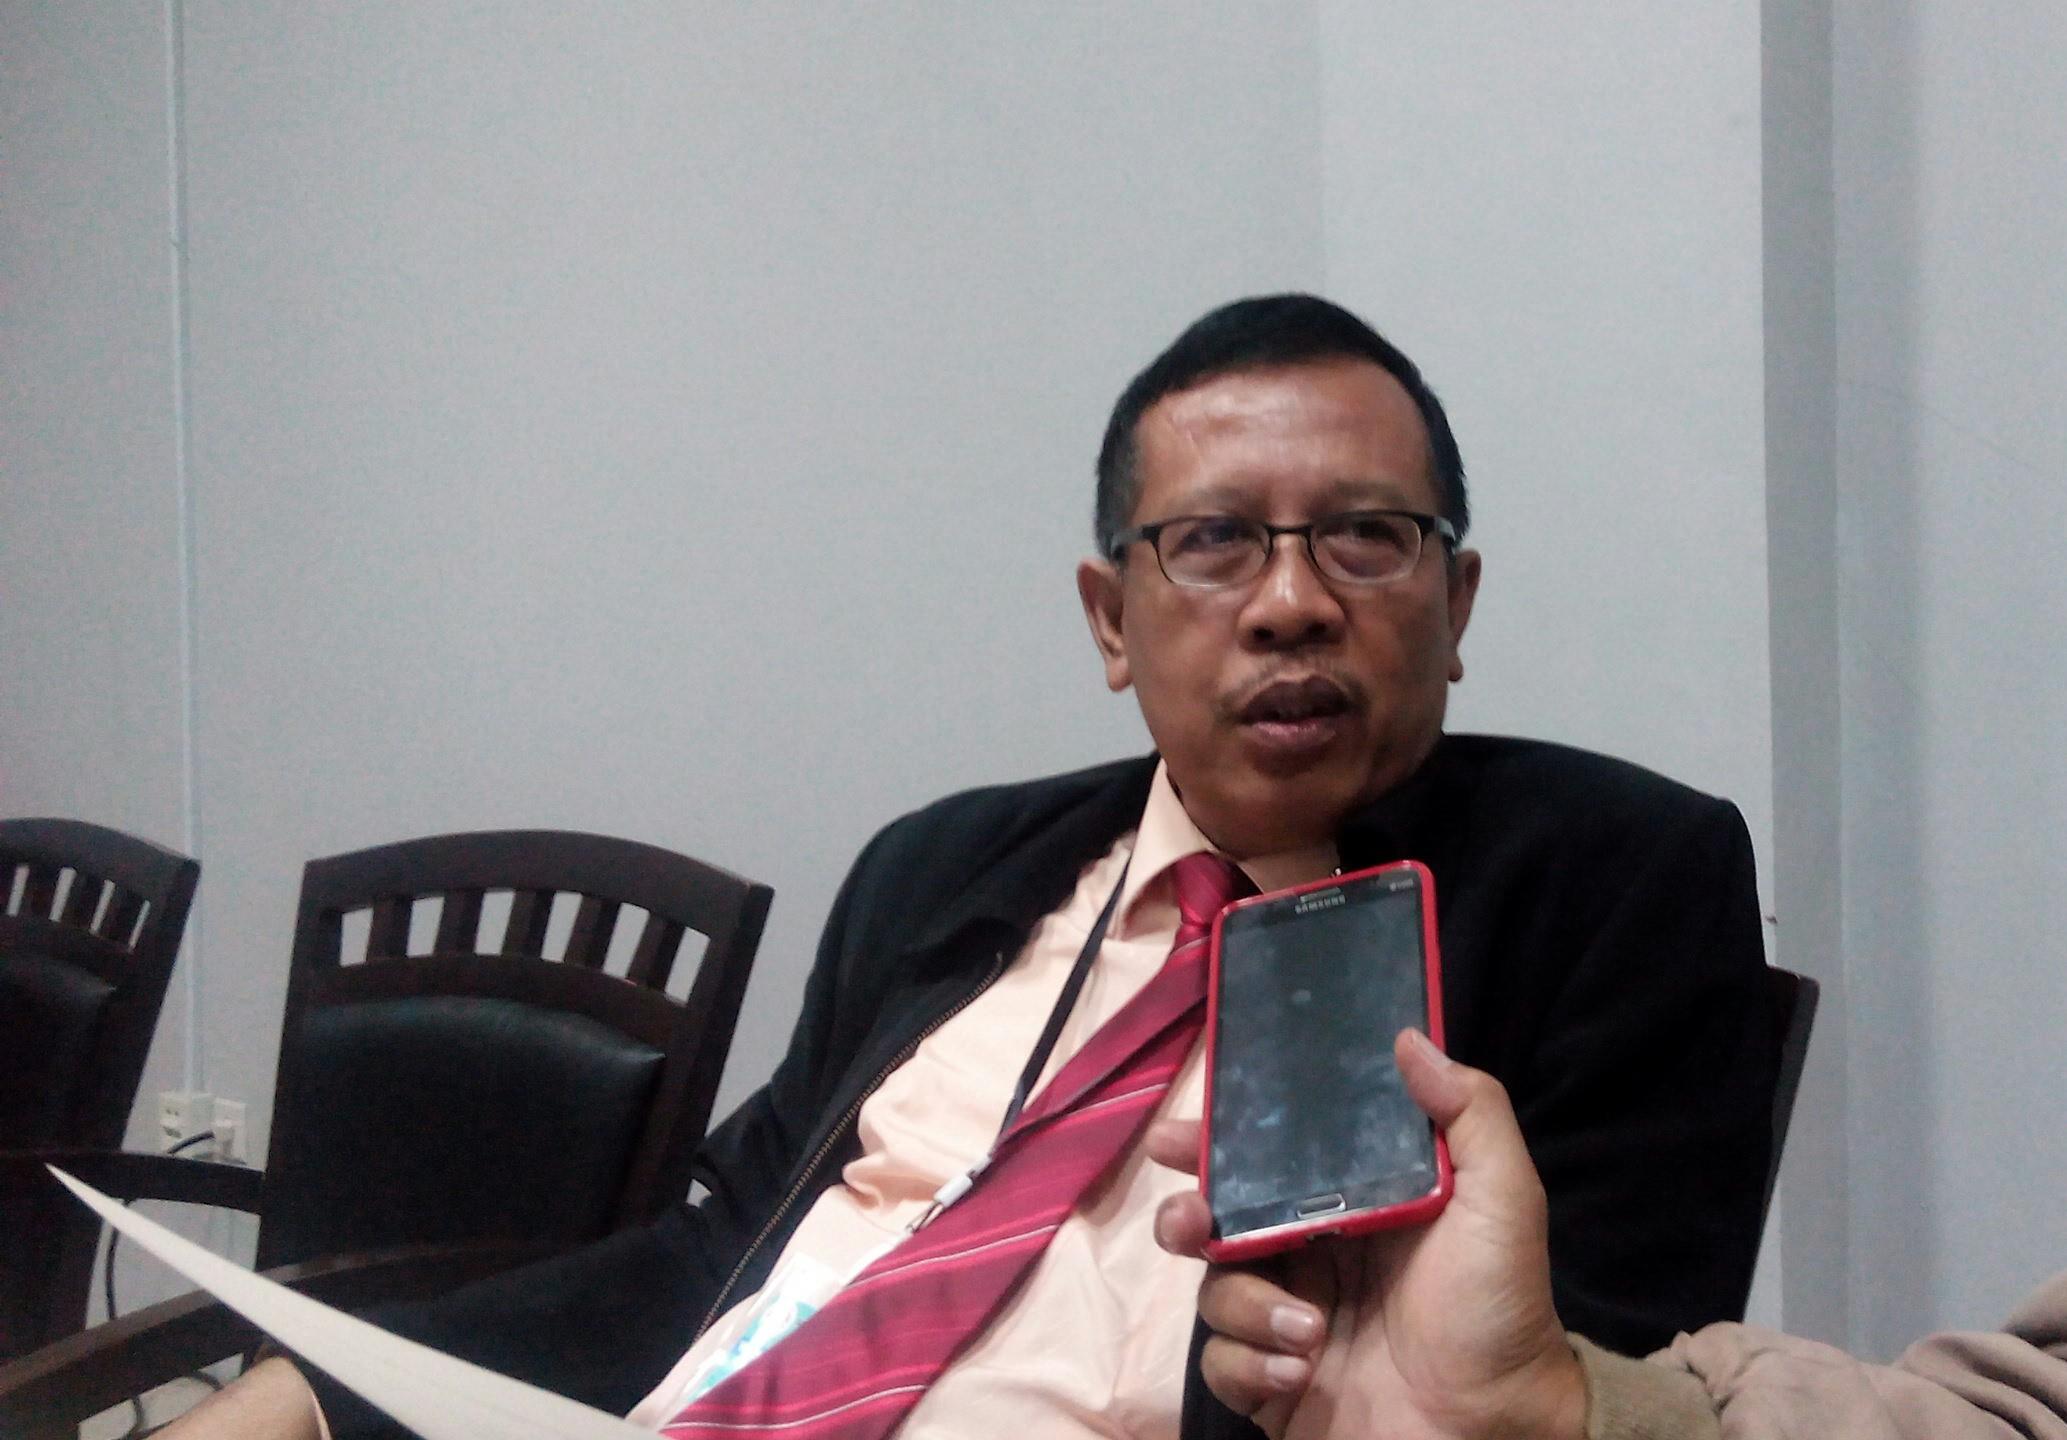 Agus Subandrijo memberikan pengalamannya untuk keberhasilan pembinaan Atlet catur kota Depok